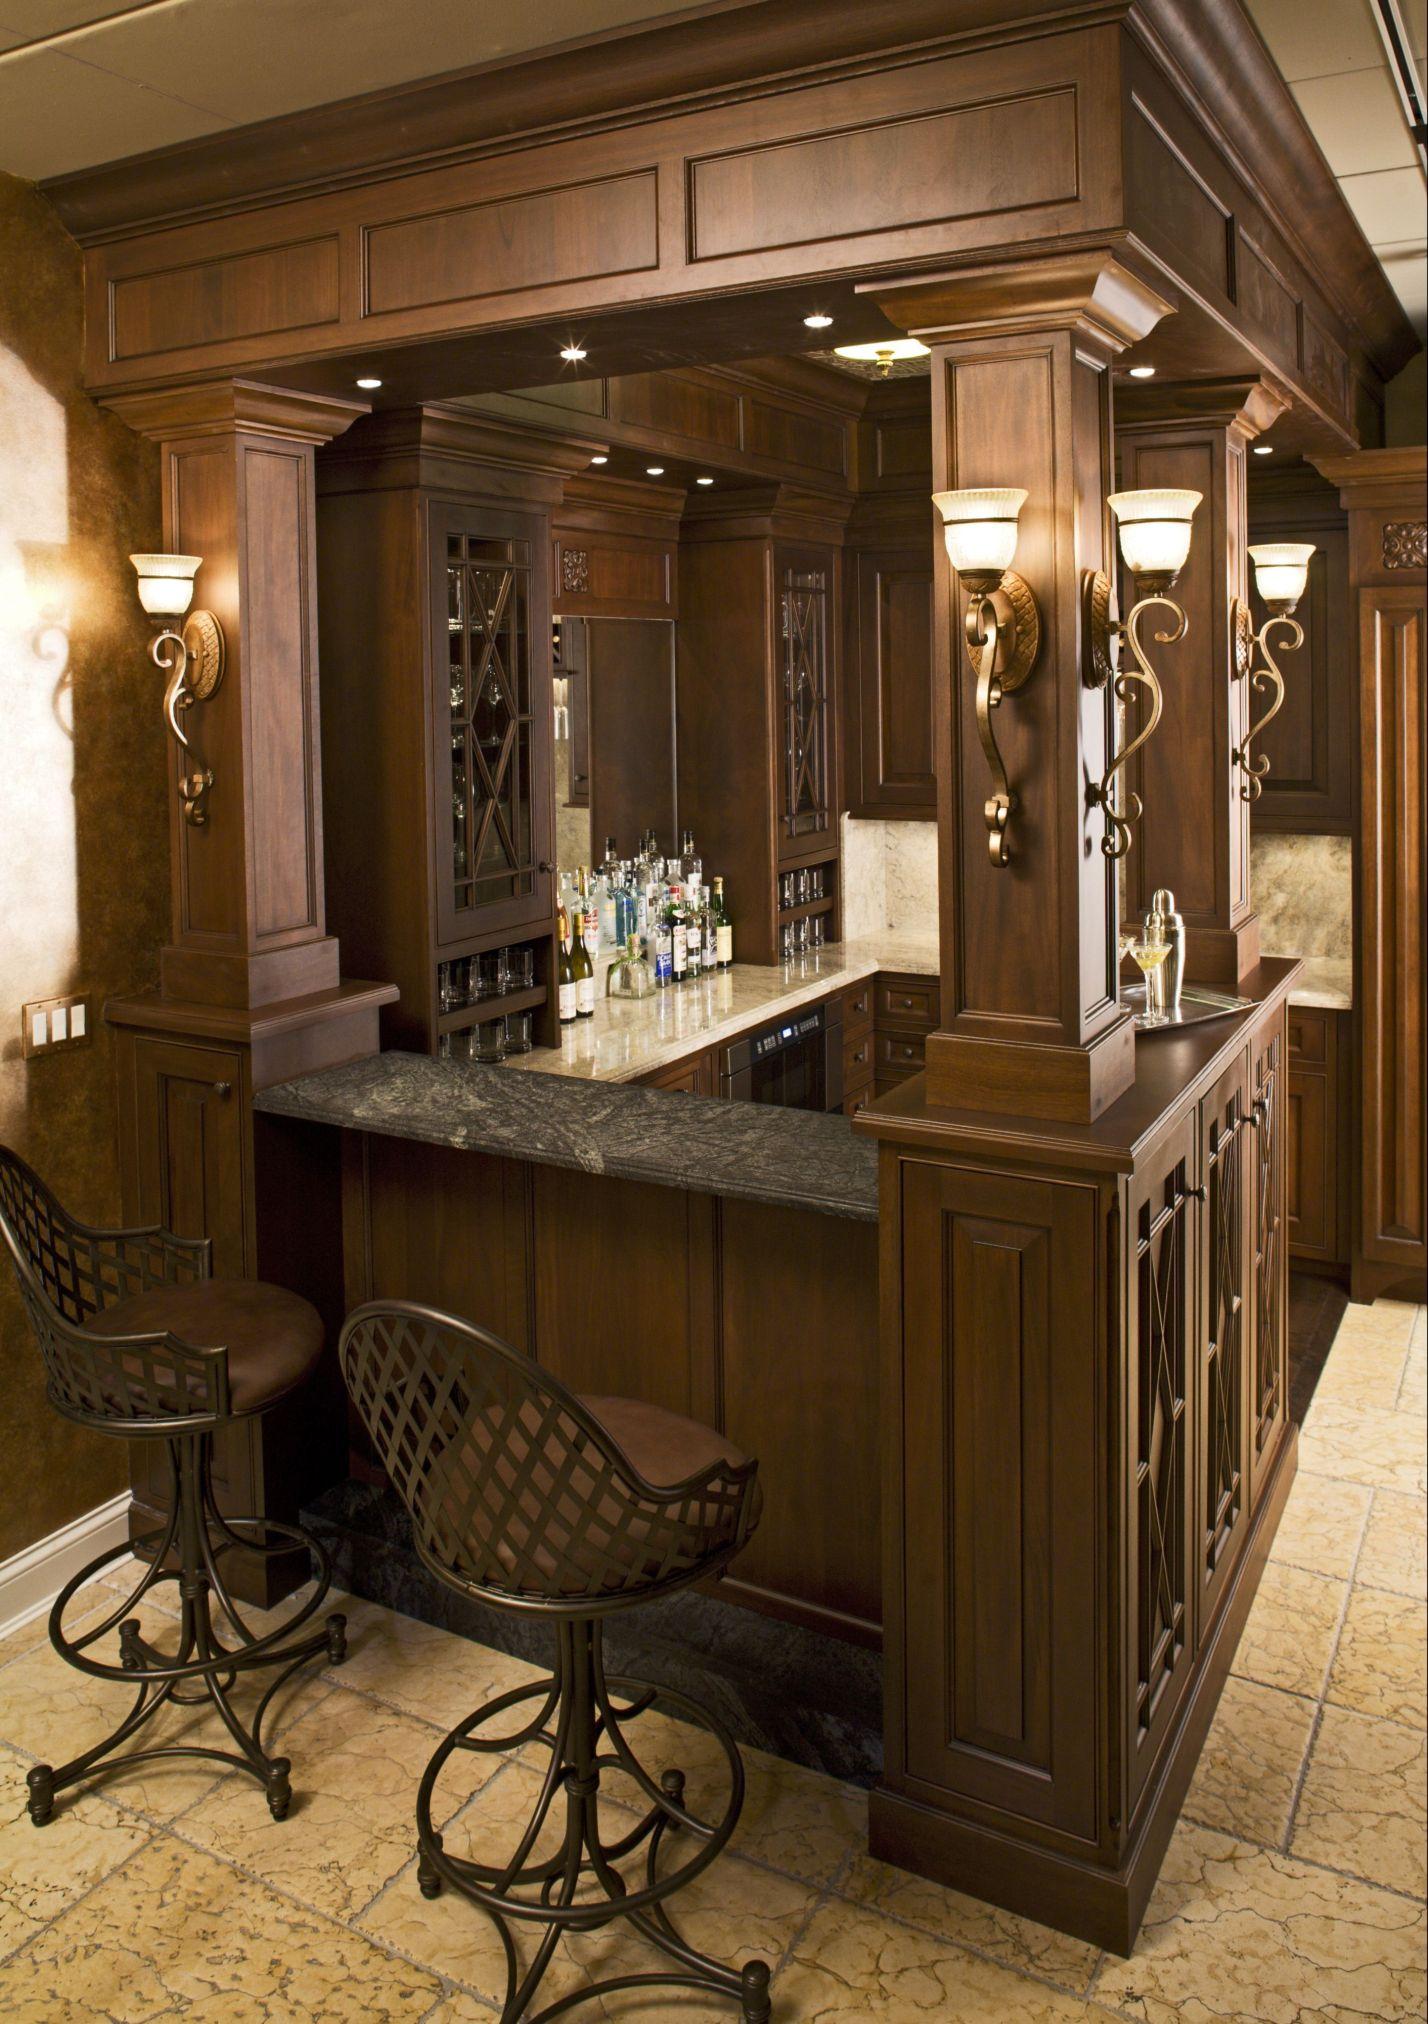 NKBA Showroom Award Drury Design Kitchen and Bath Studio